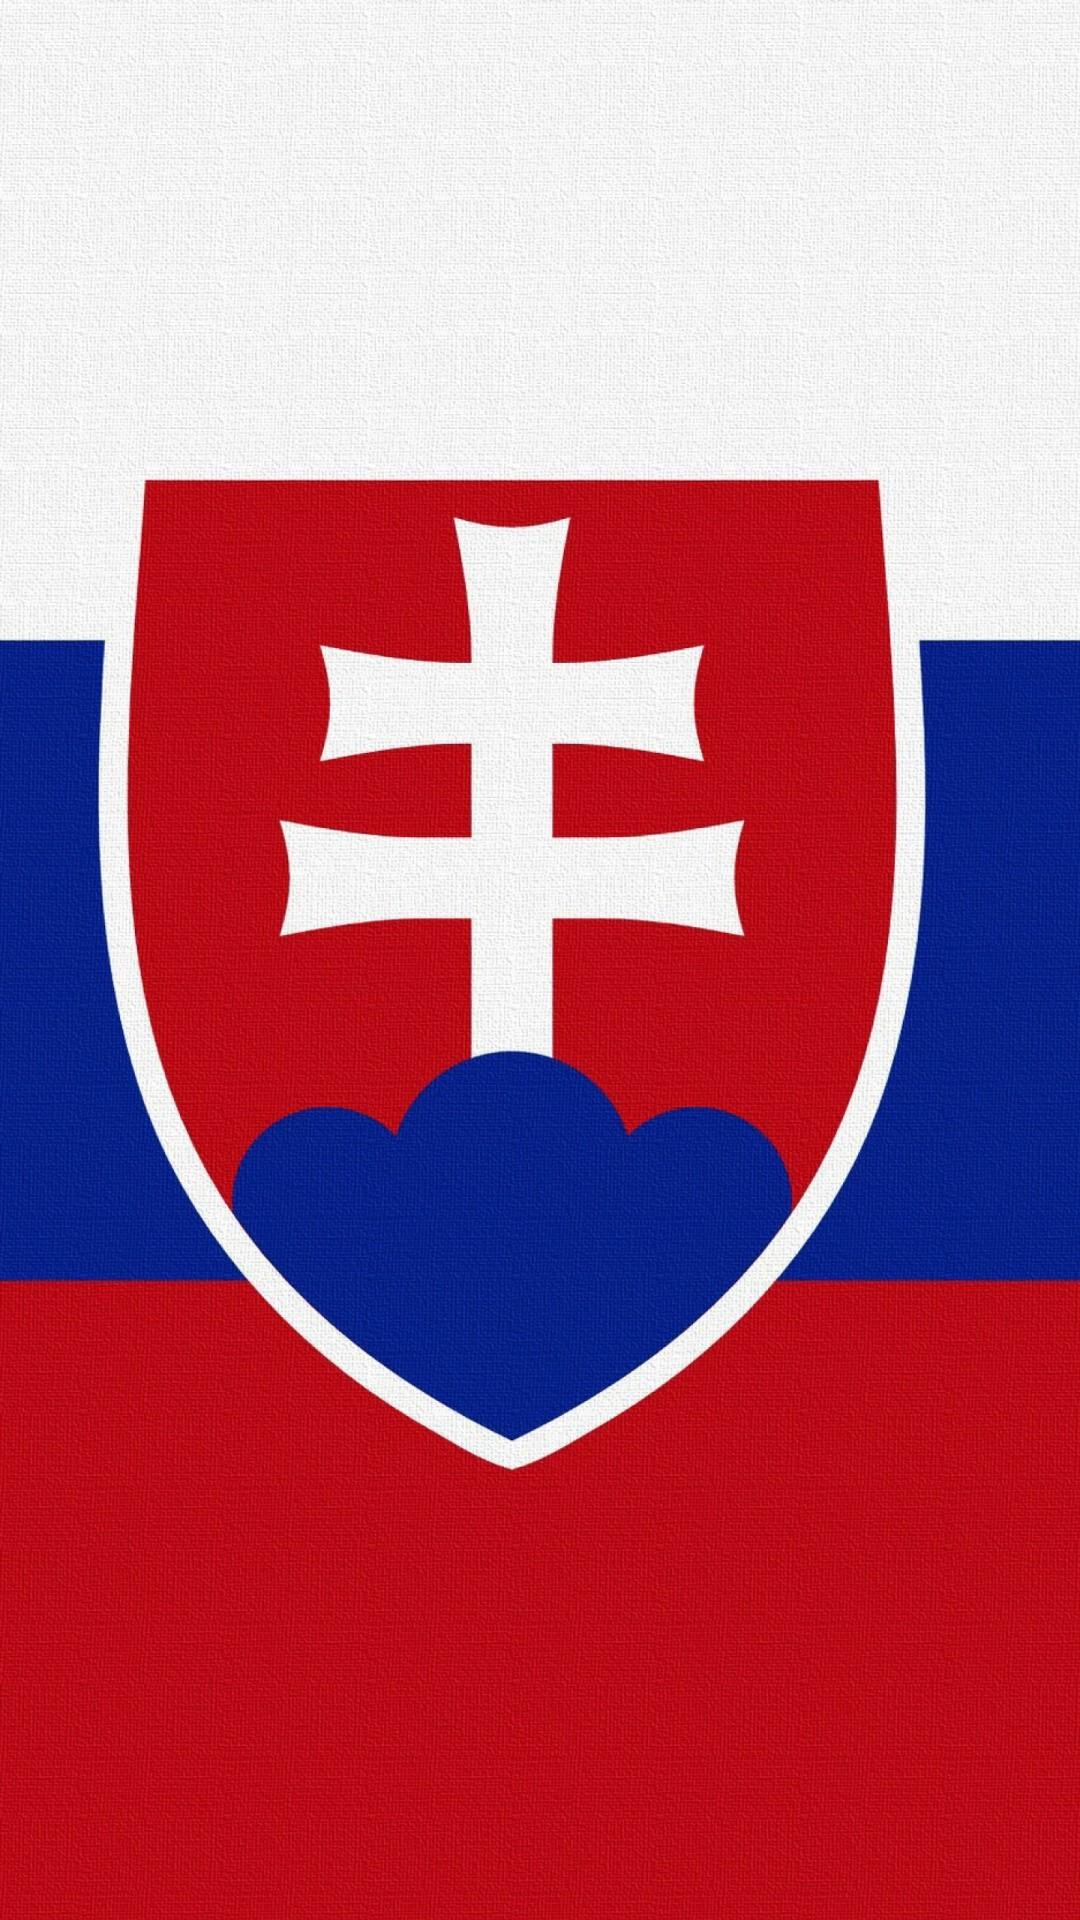 Slovakia flag iphone 6 mobile wallpapers free